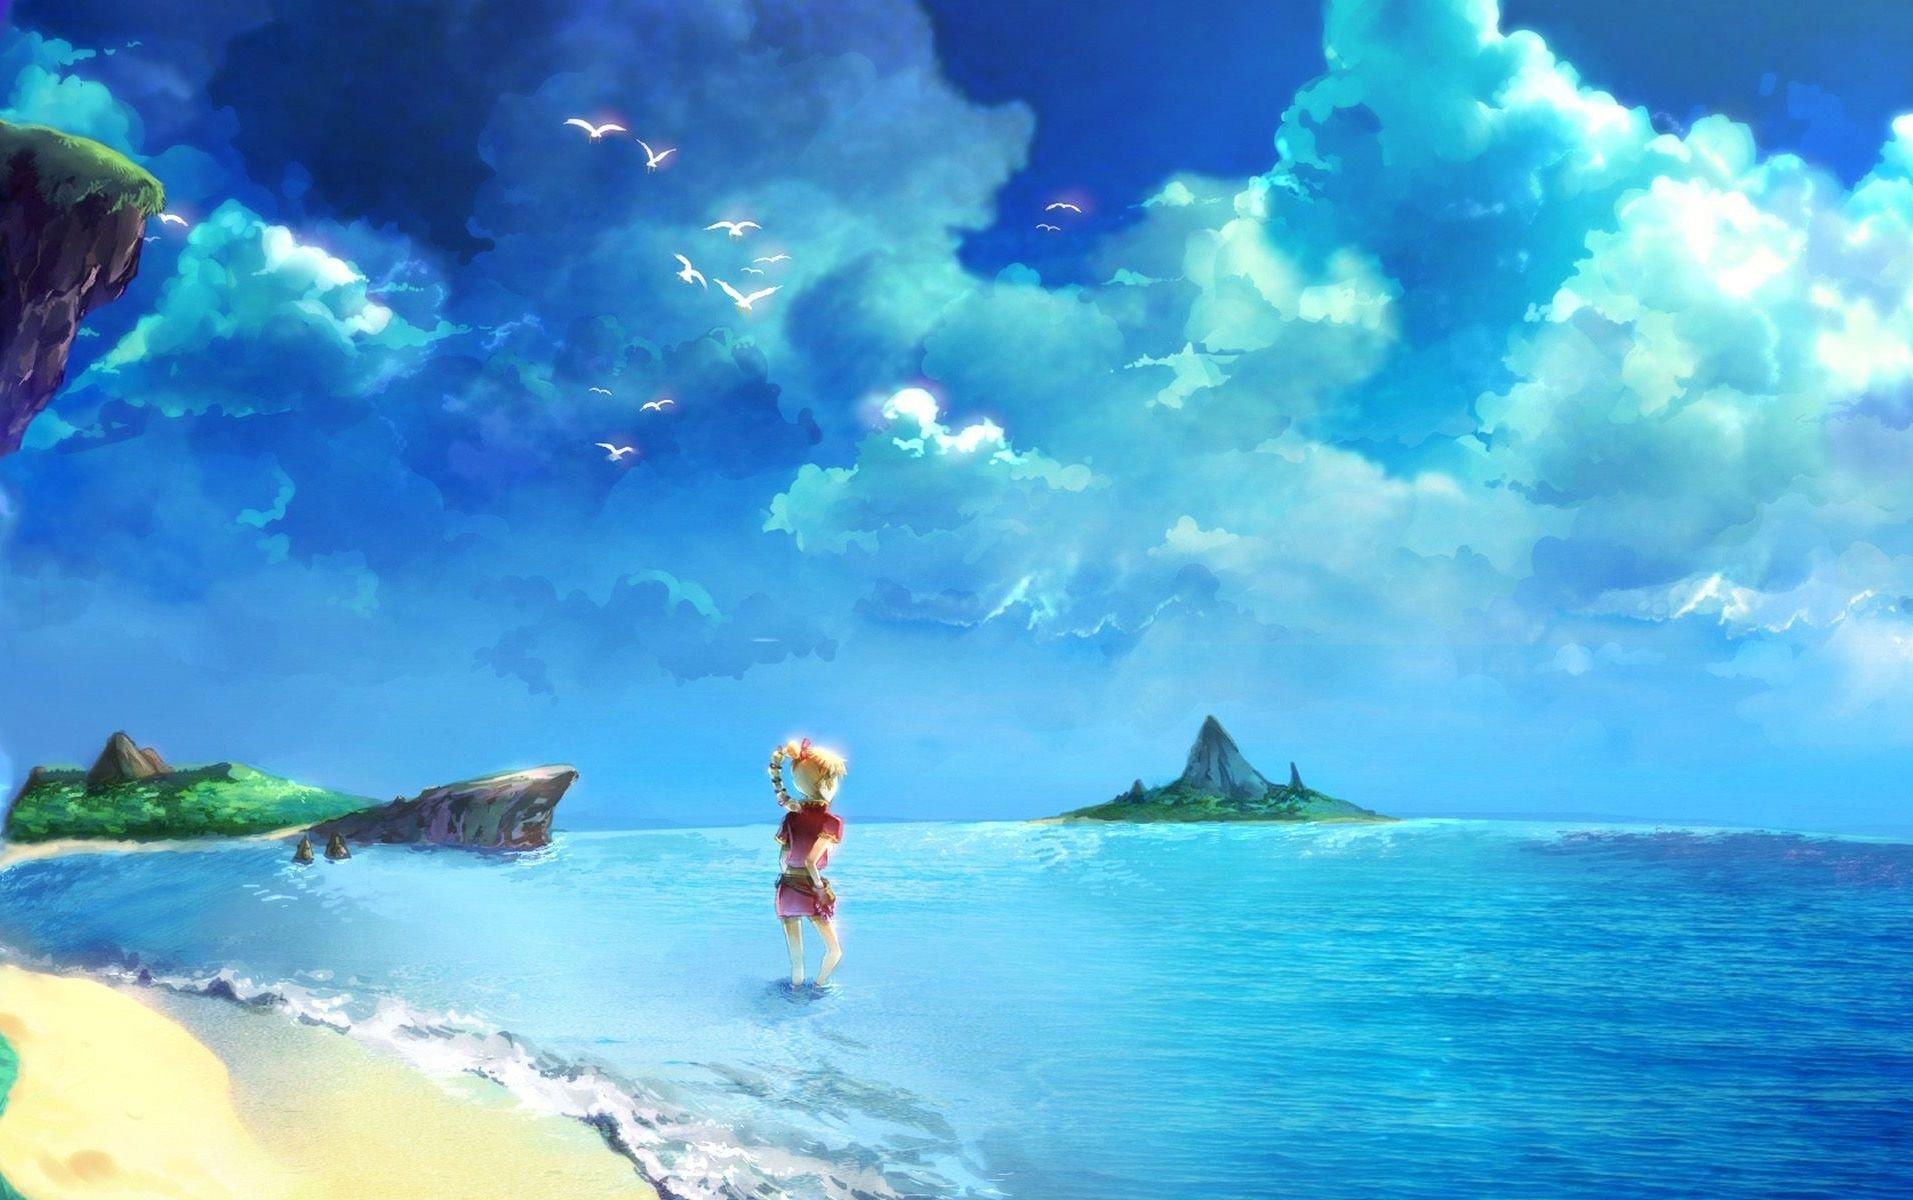 Video games chrono cross square enix anime girls beaches - Beach anime girl ...